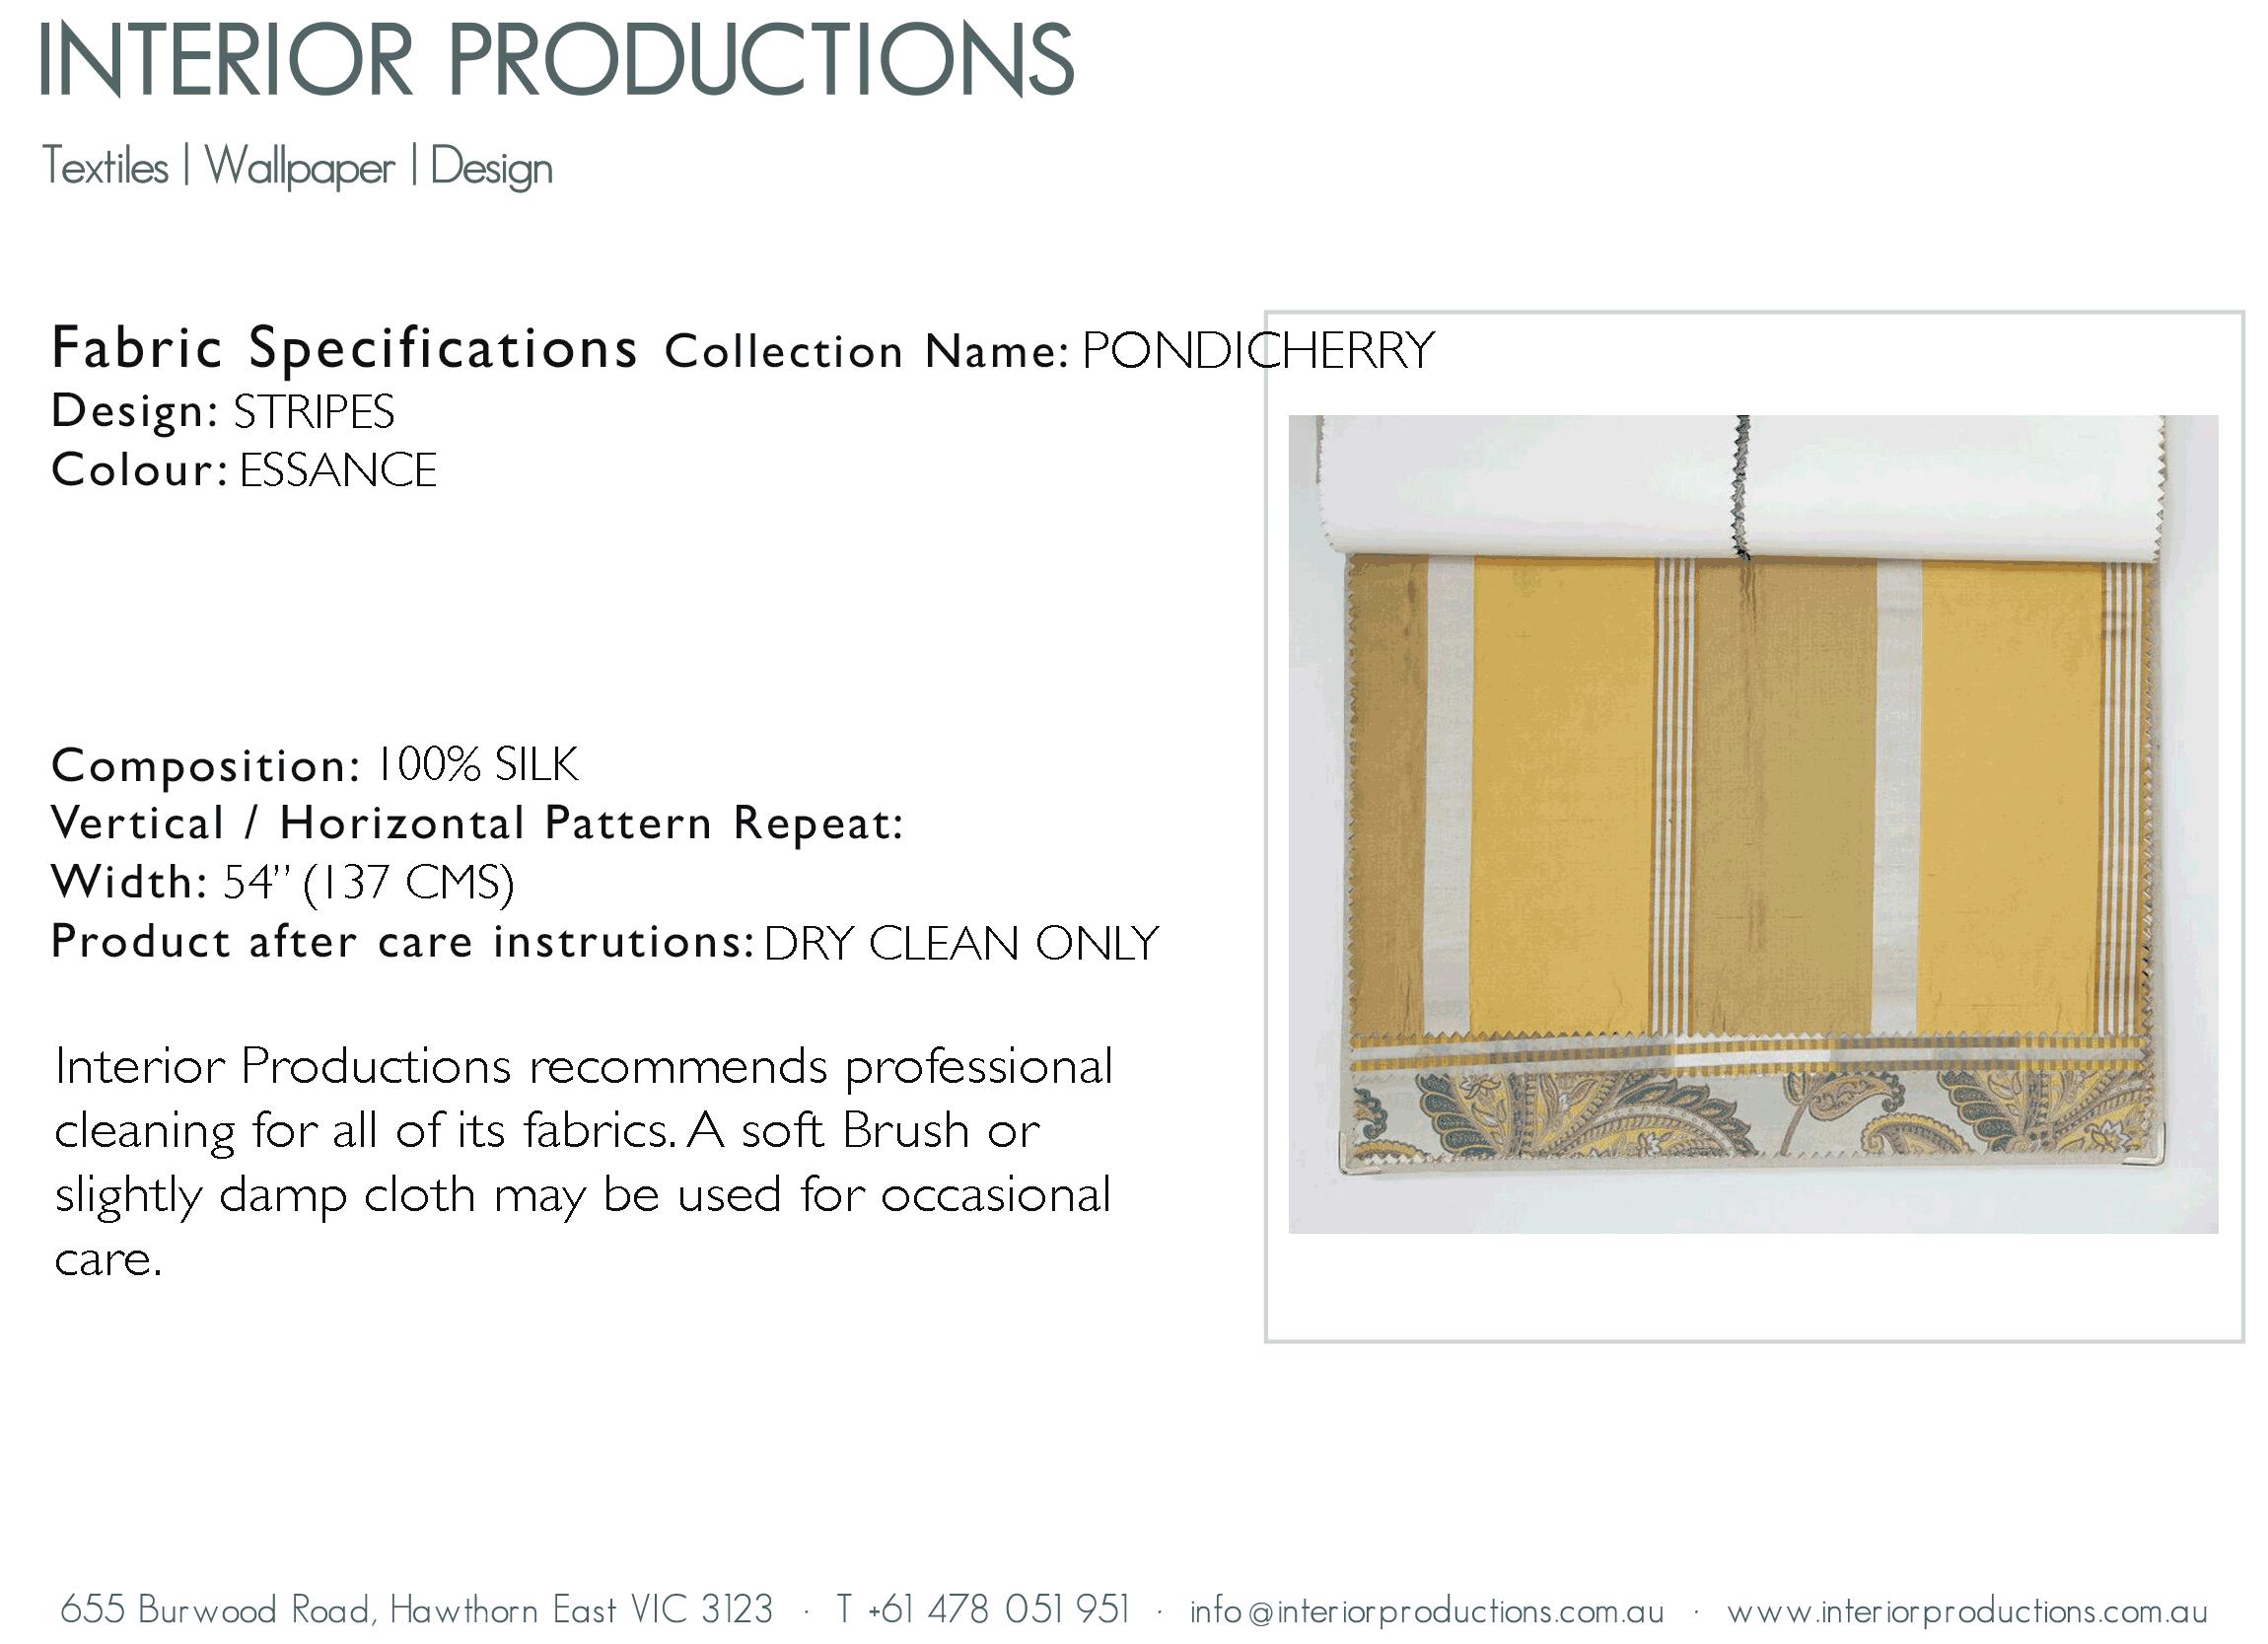 interior_productions_STRIPES---ESSANCE